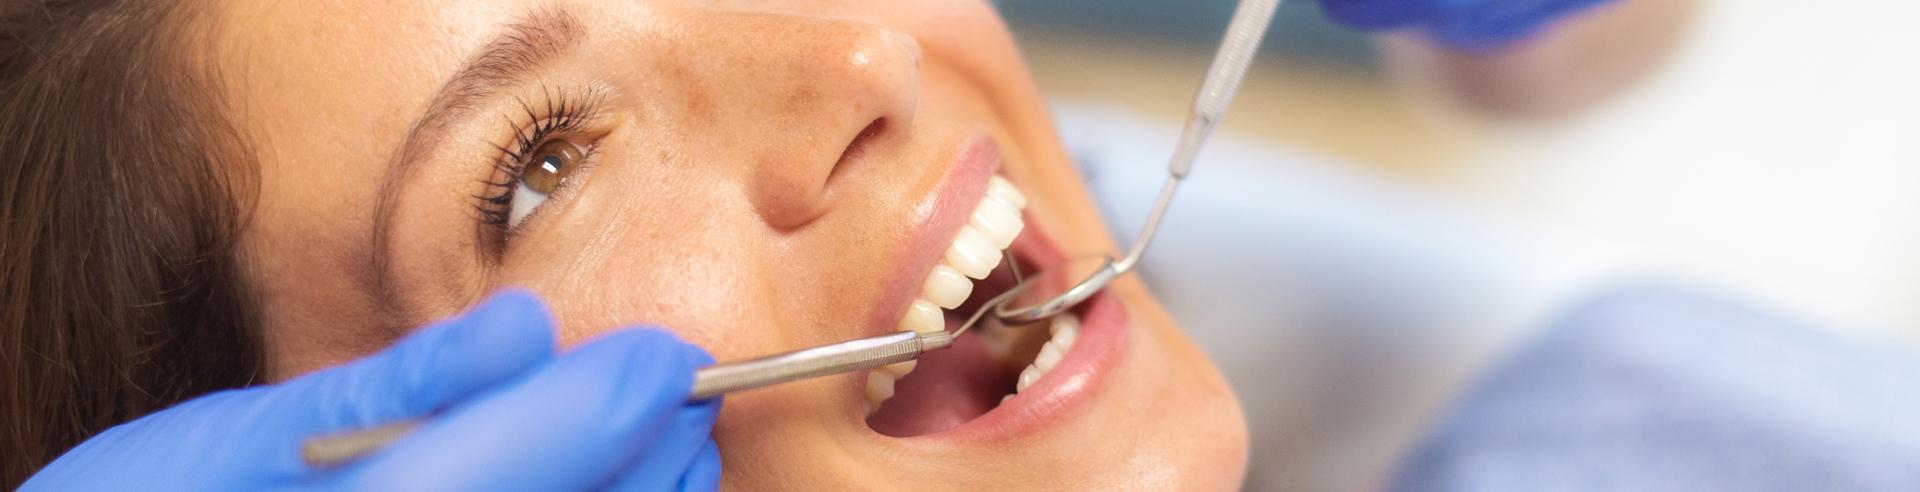 Full Teeth Examination Sidcup